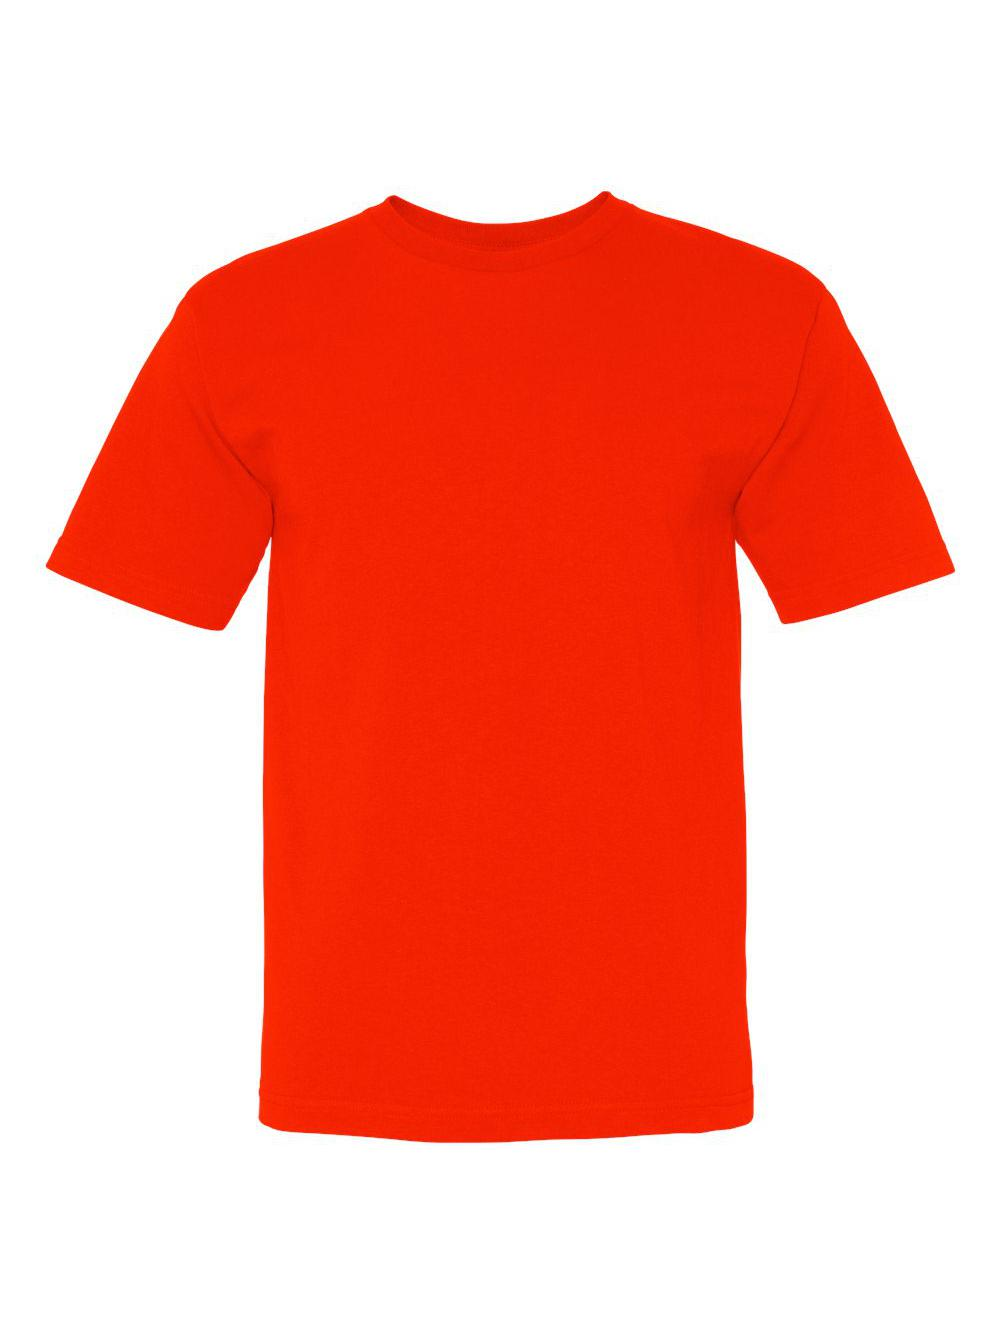 Bayside-USA-Made-100-Cotton-Short-Sleeve-T-Shirt-5040 thumbnail 6